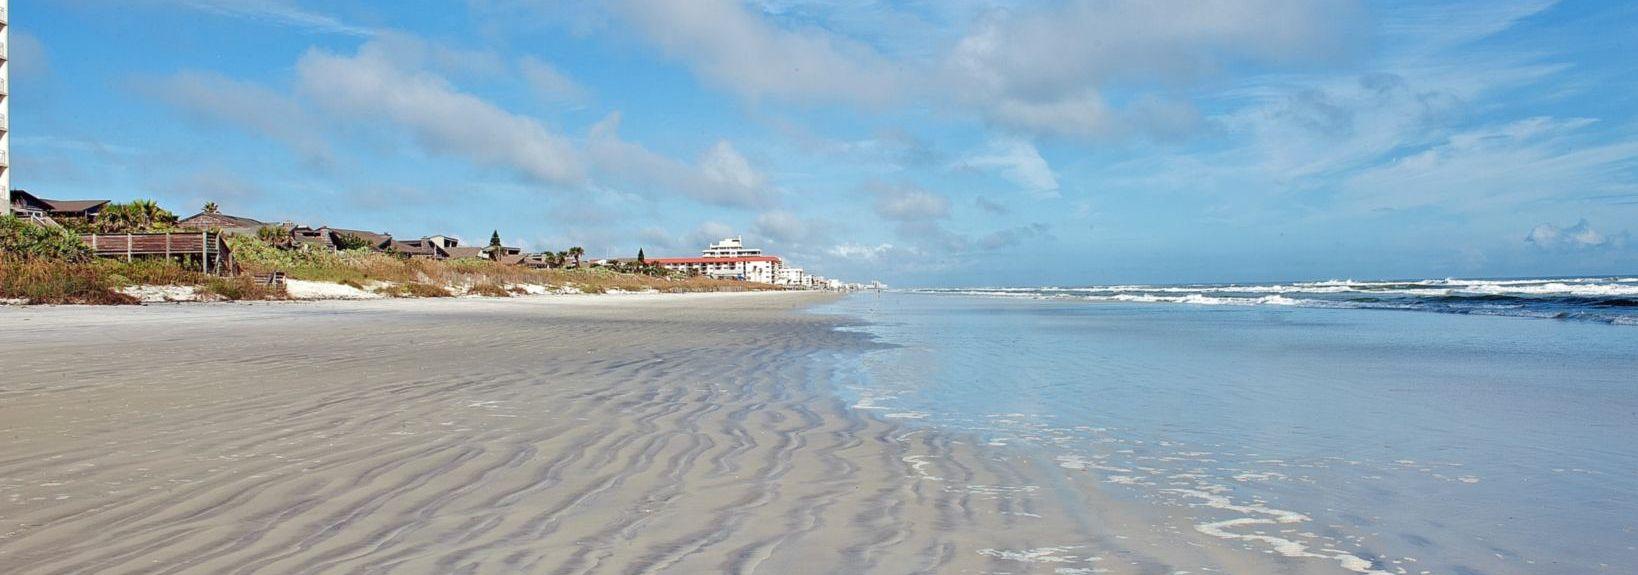 Smyrna Beach Club New Vacation Als For